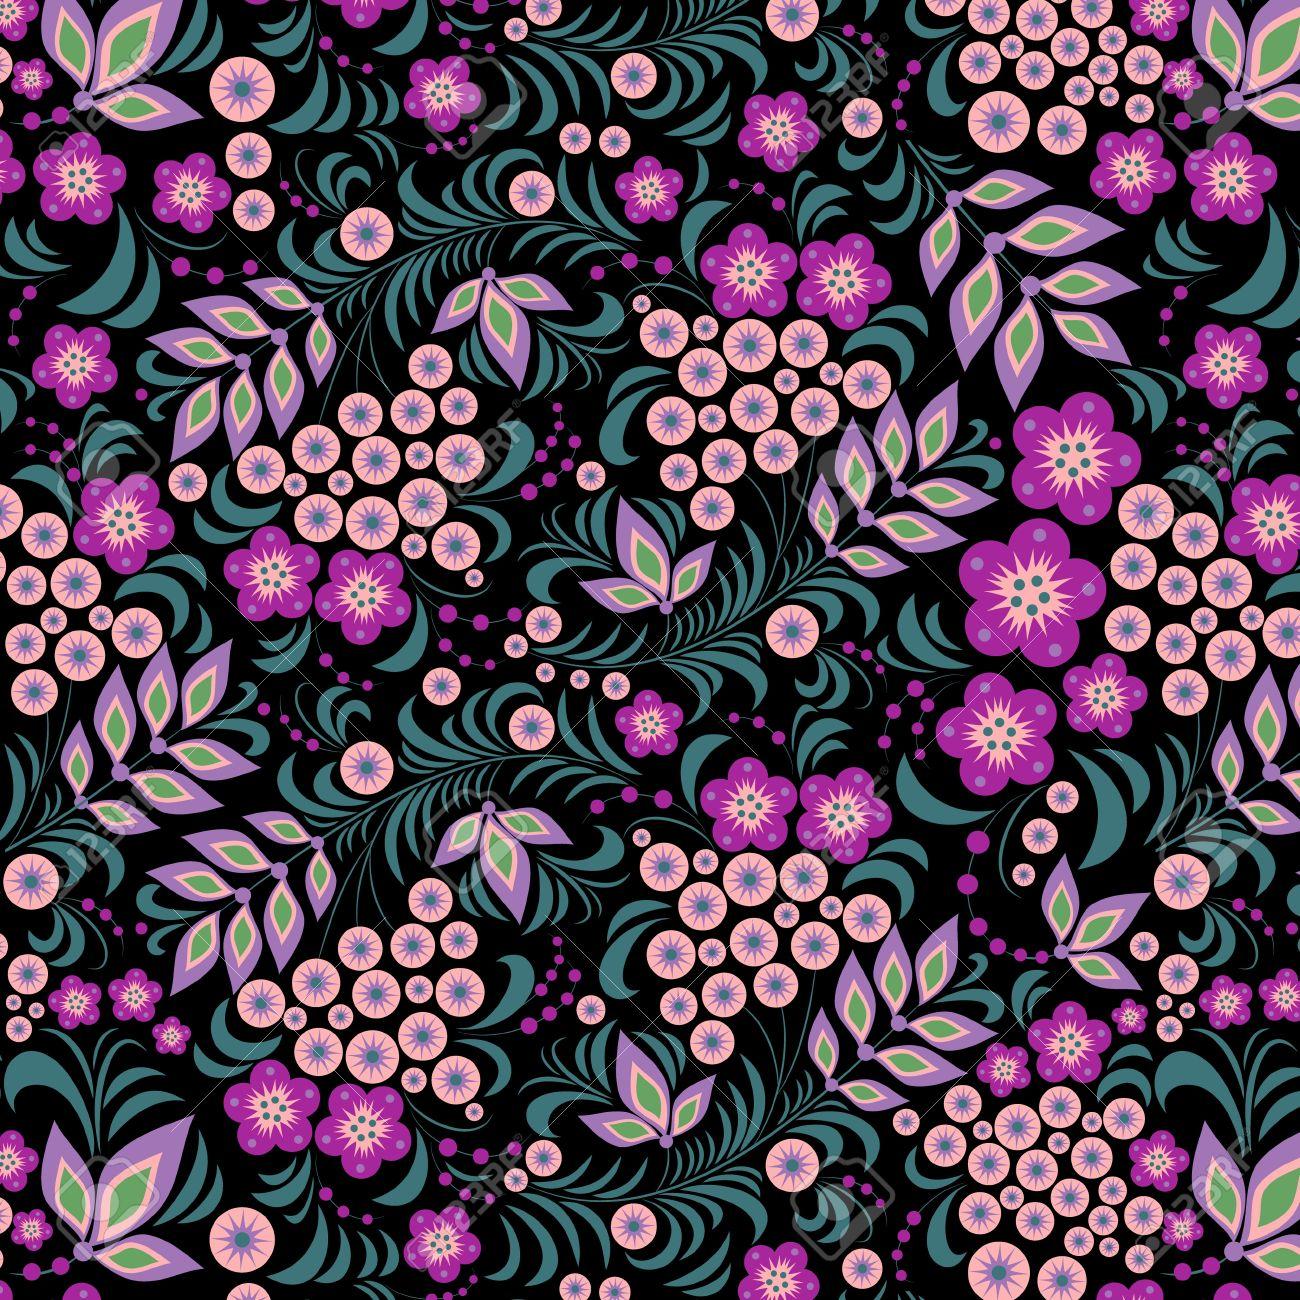 Ilustracion De Patron Transparente De Flores De Colores Sobre Fondo